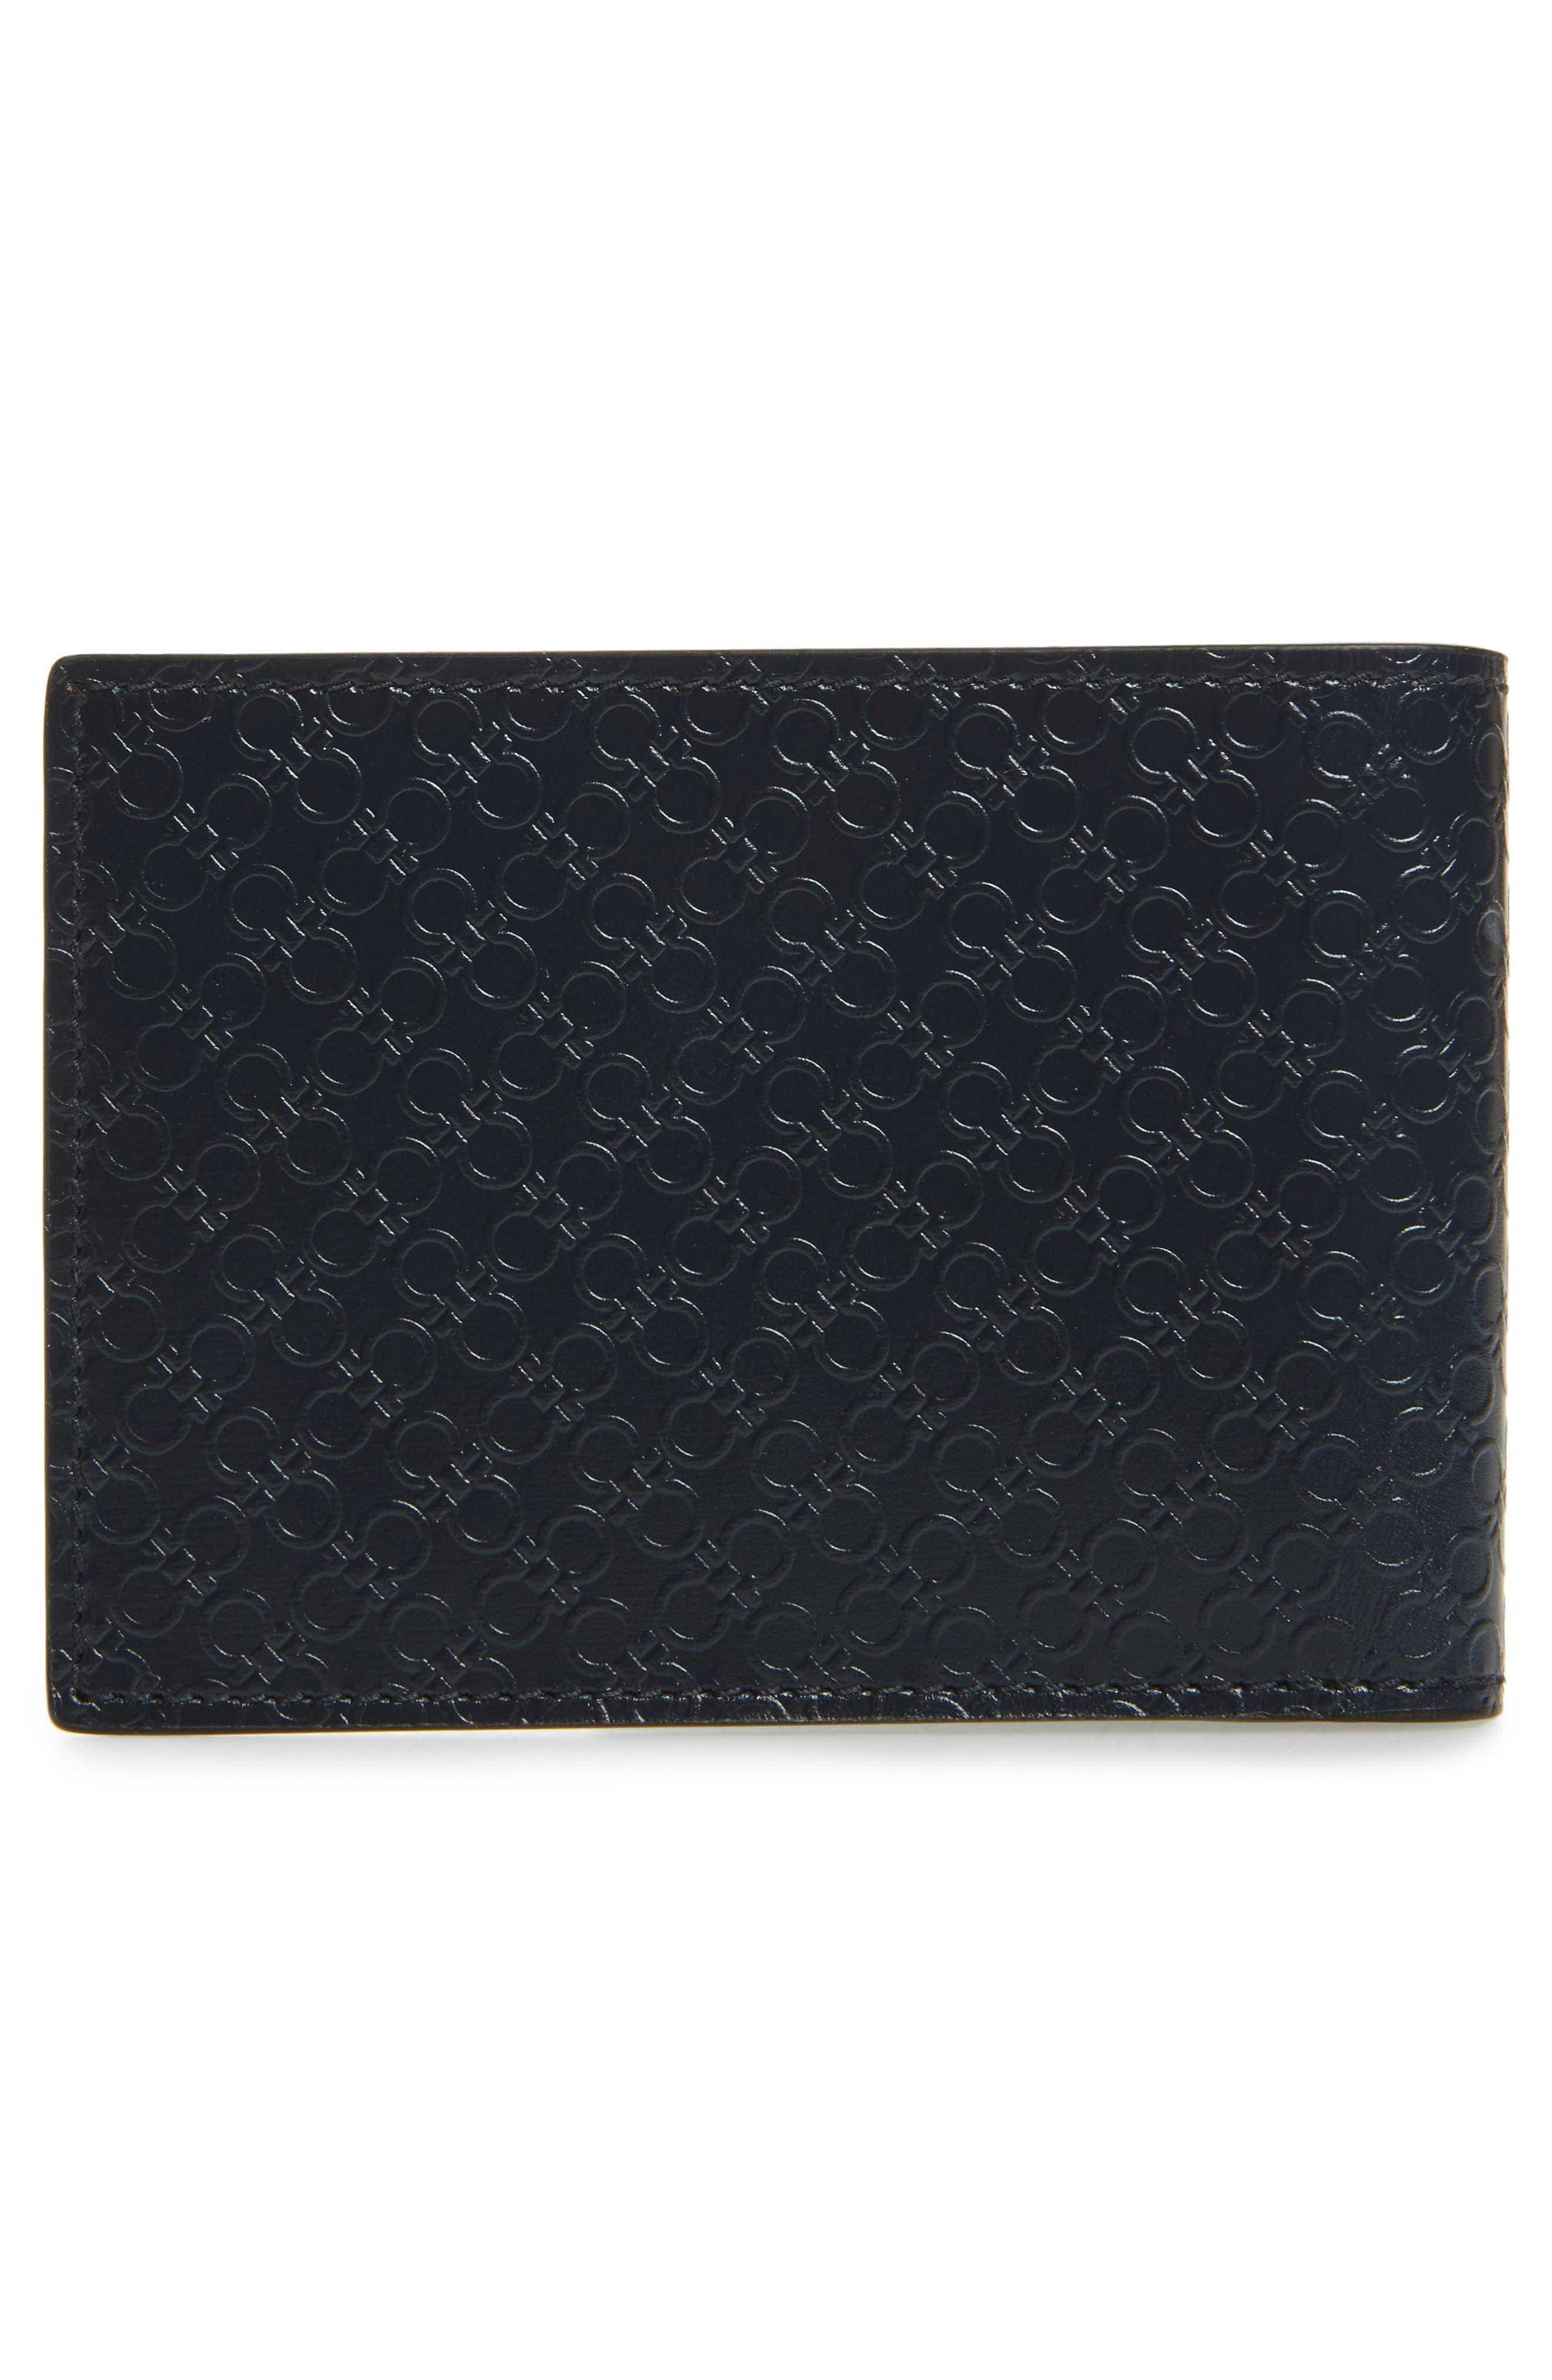 Gancini Leather Card Case,                             Alternate thumbnail 2, color,                             Blue Marine